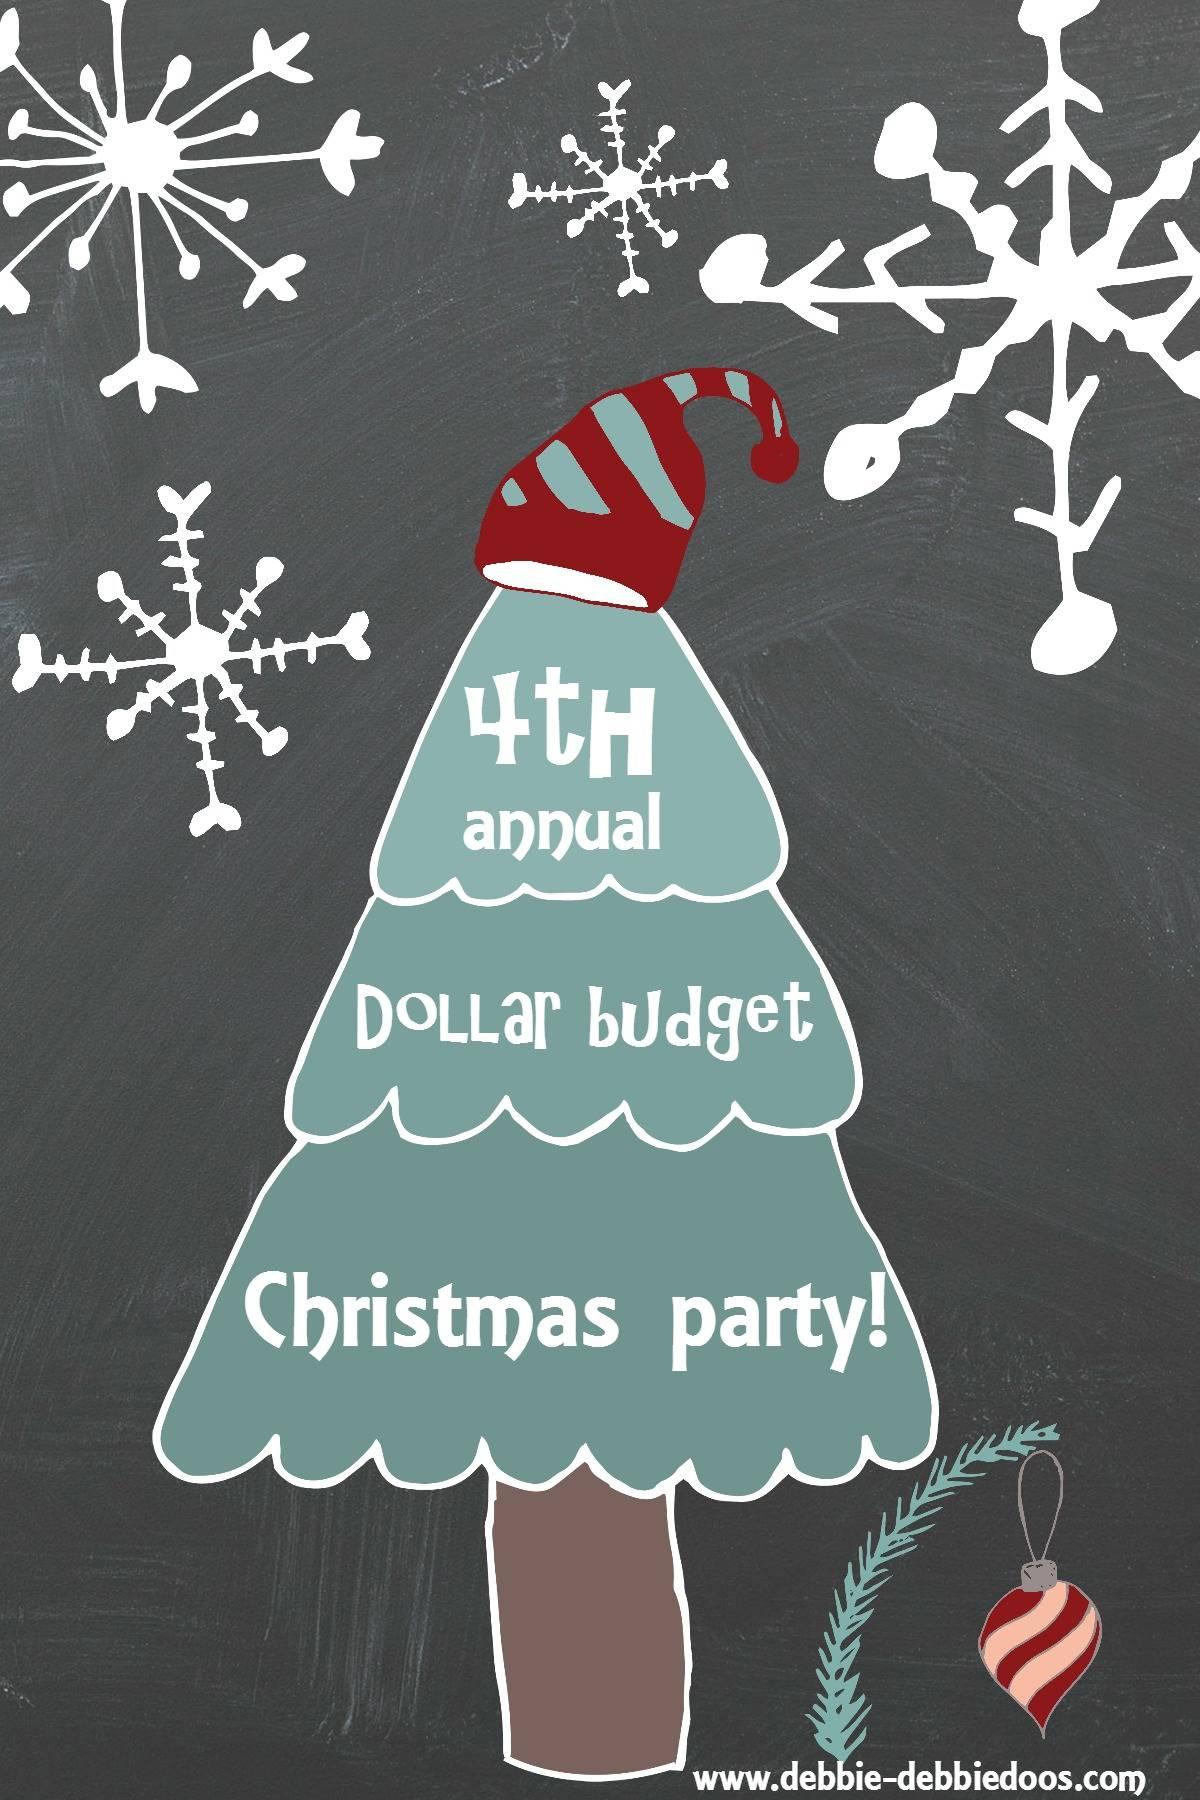 dollar store christmas extravaganza debbiedoos - Dollar Tree Hours Christmas Eve